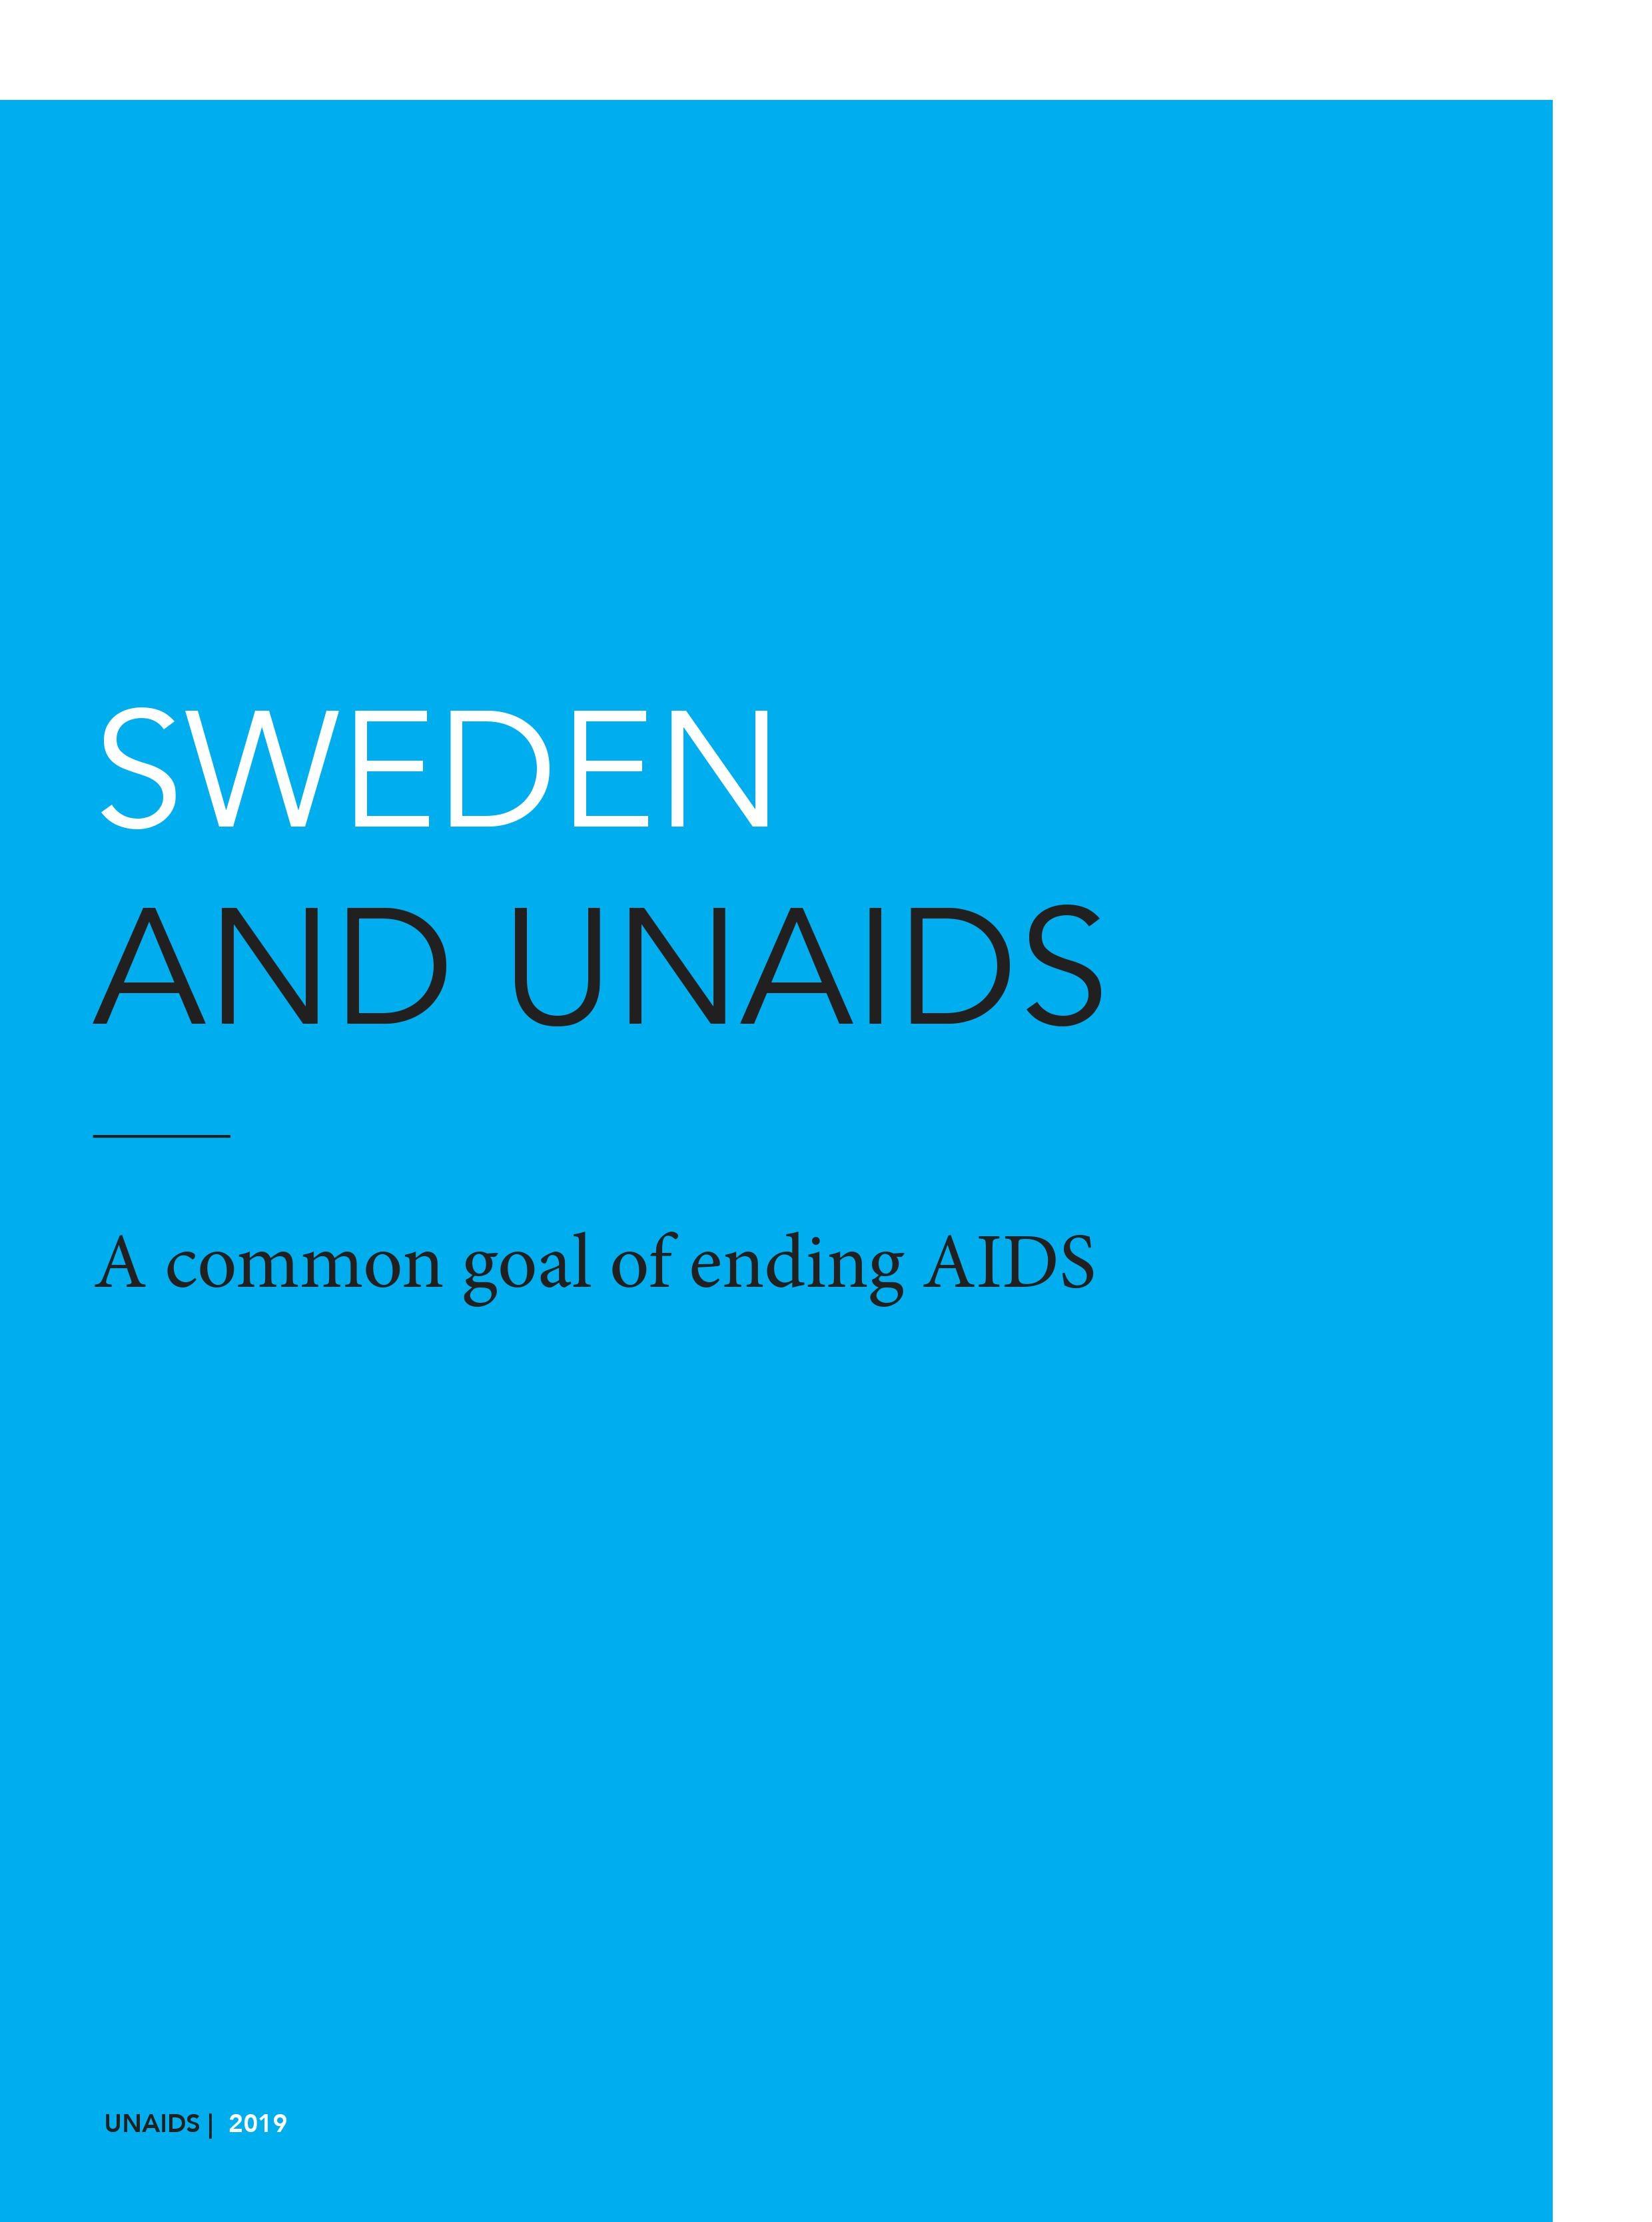 Sweden and UNAIDS